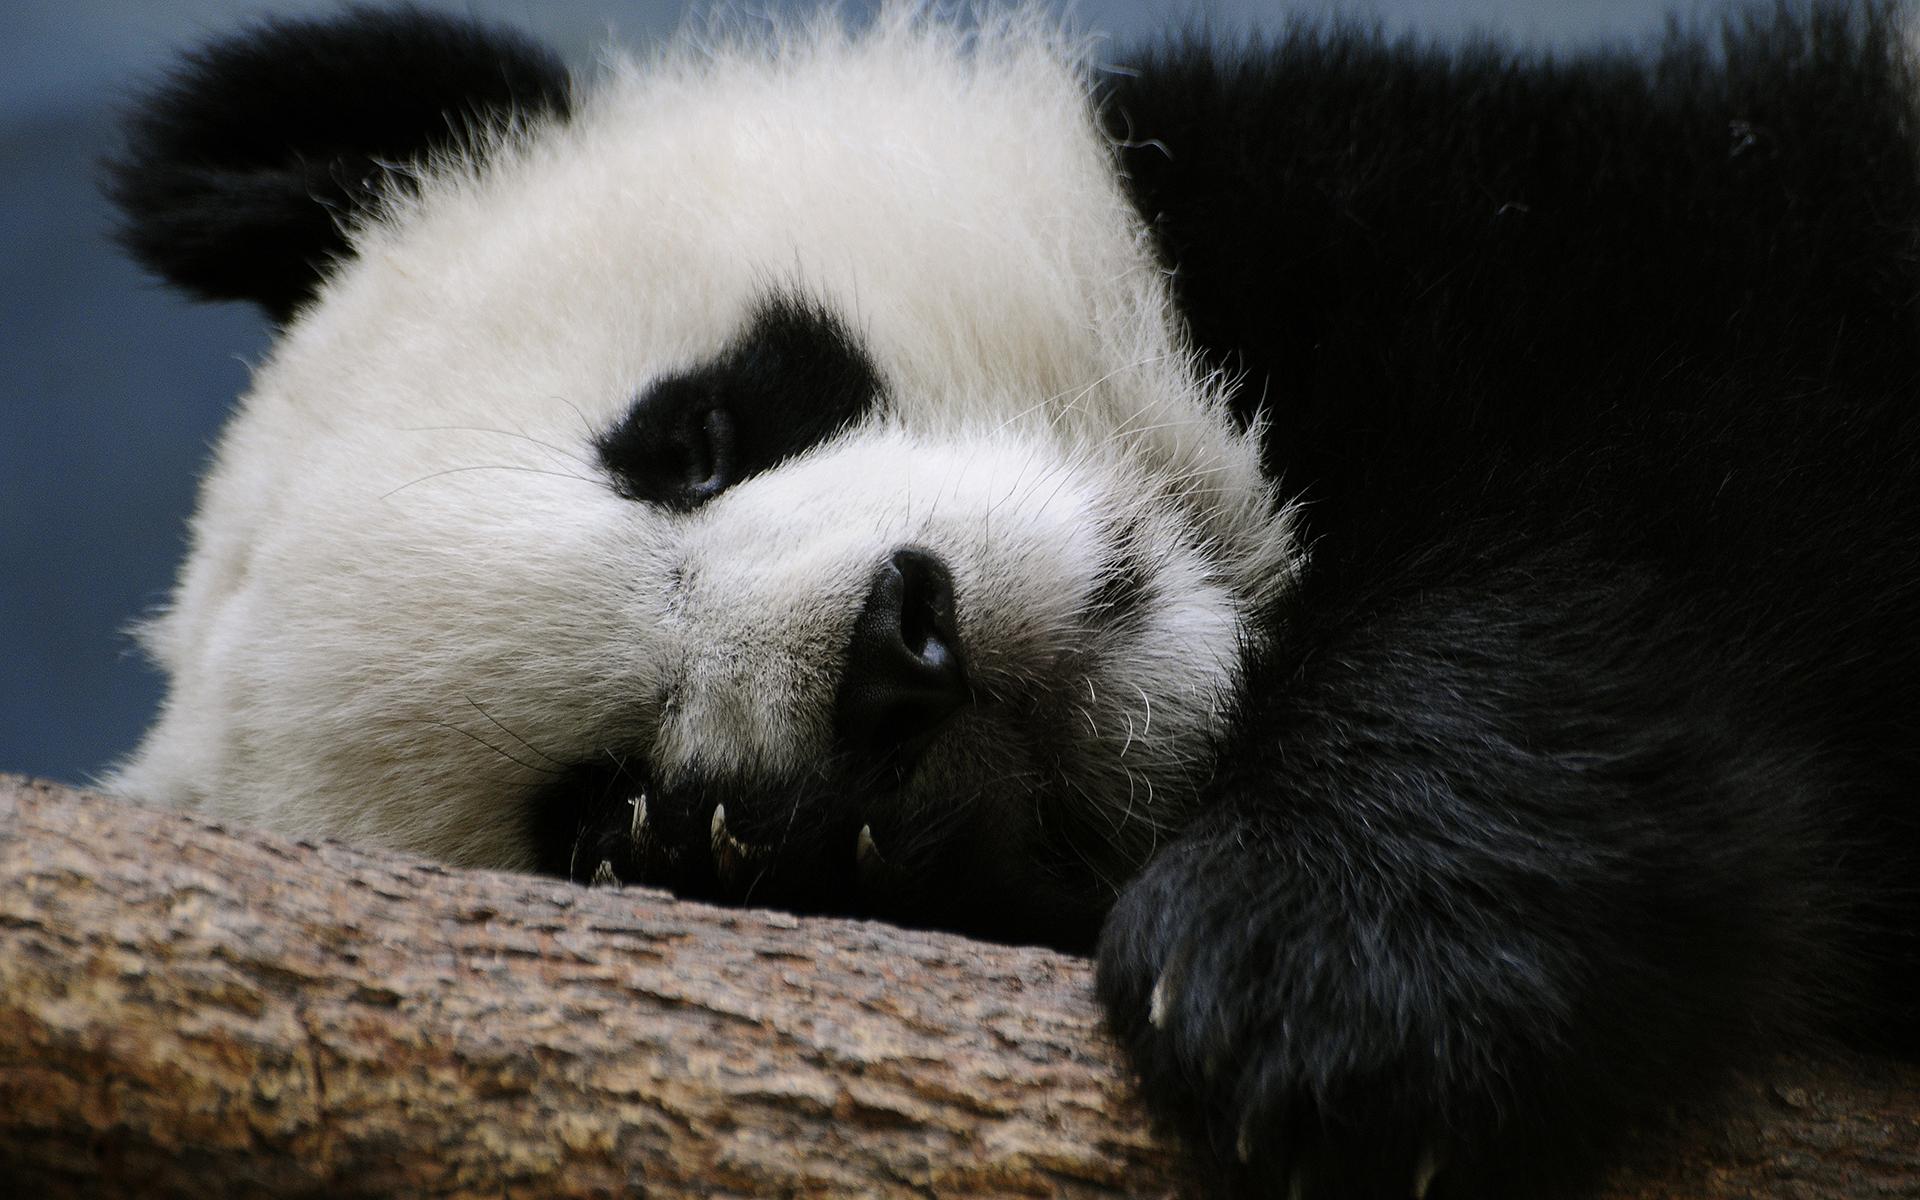 Cute little panda sleeping